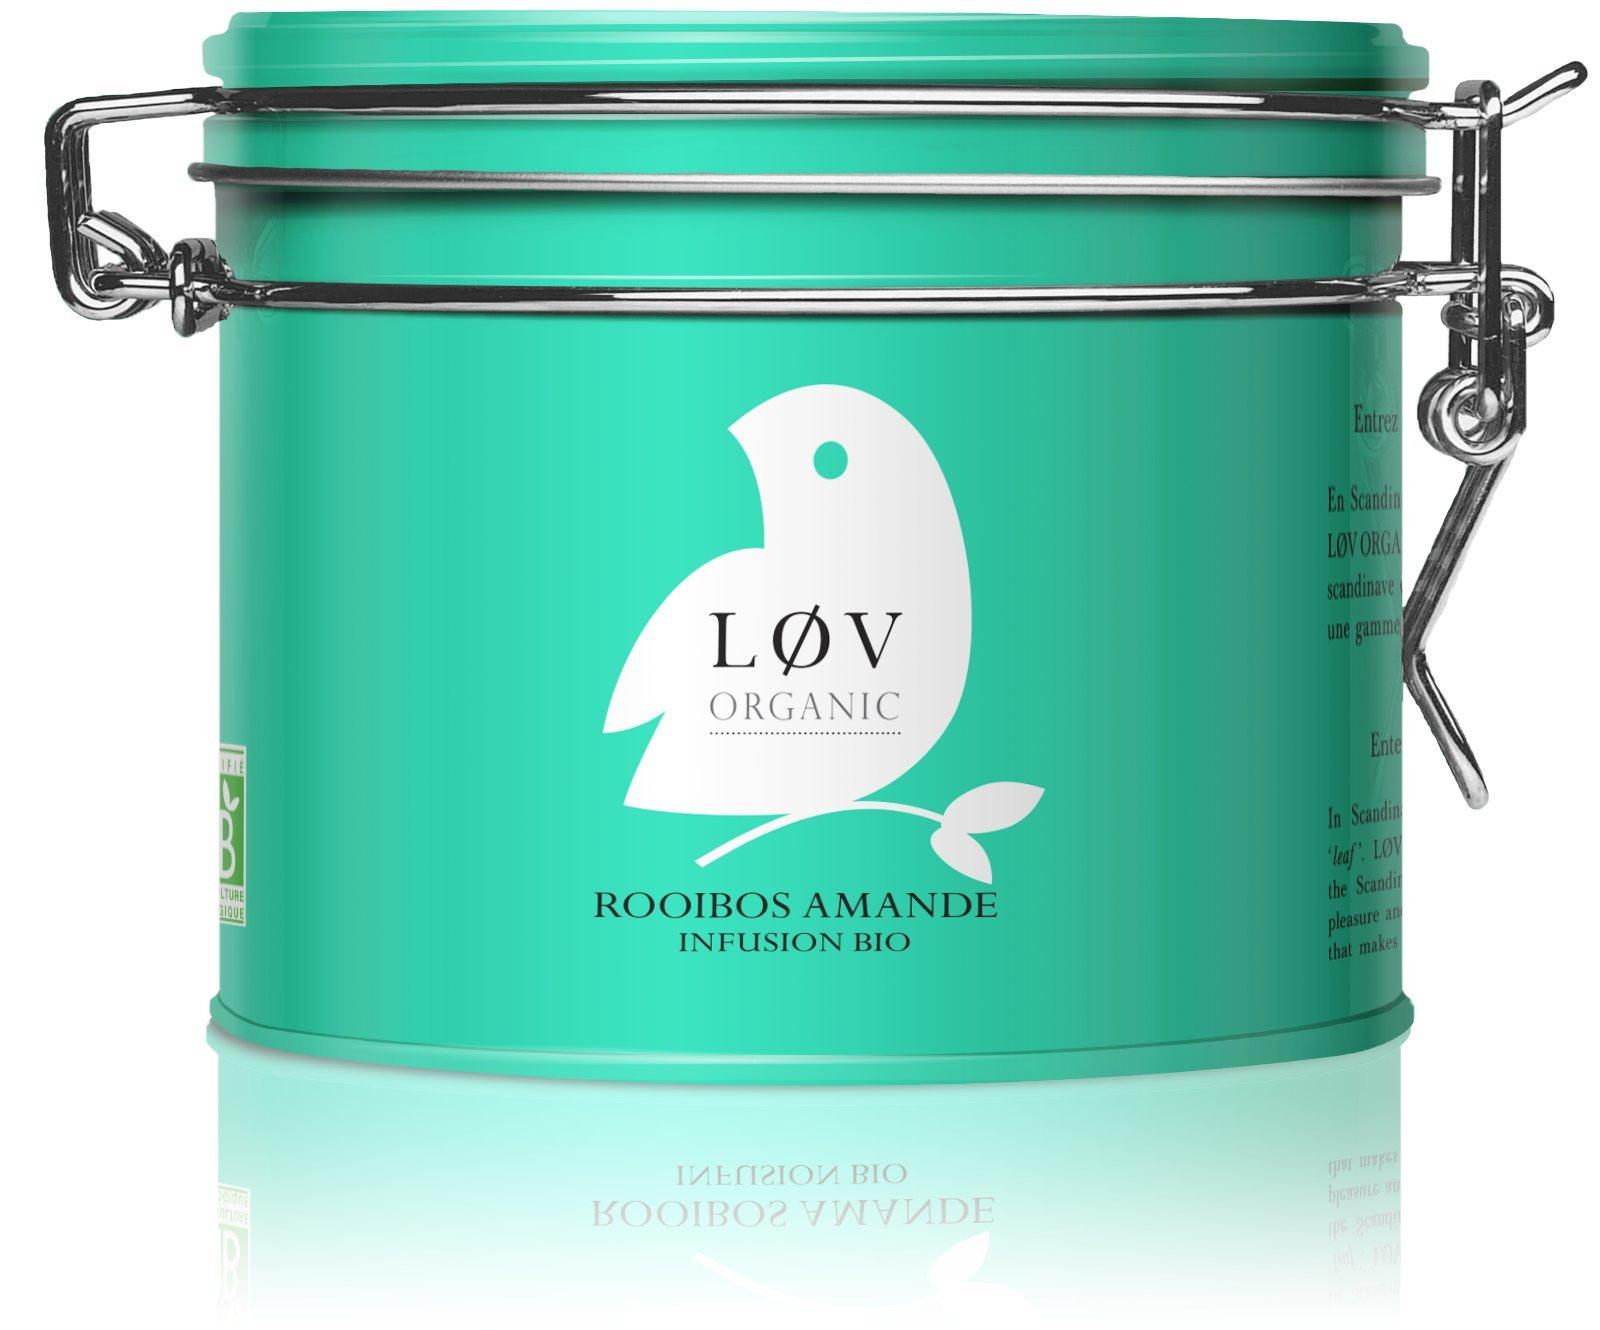 Løv Organic Almond Rooibos Tea - Organic Almond Blend Calming Caffeine-Free Tea (3.5oz Loose Tea Tin - 40 Servings) by LØV ORGANIC